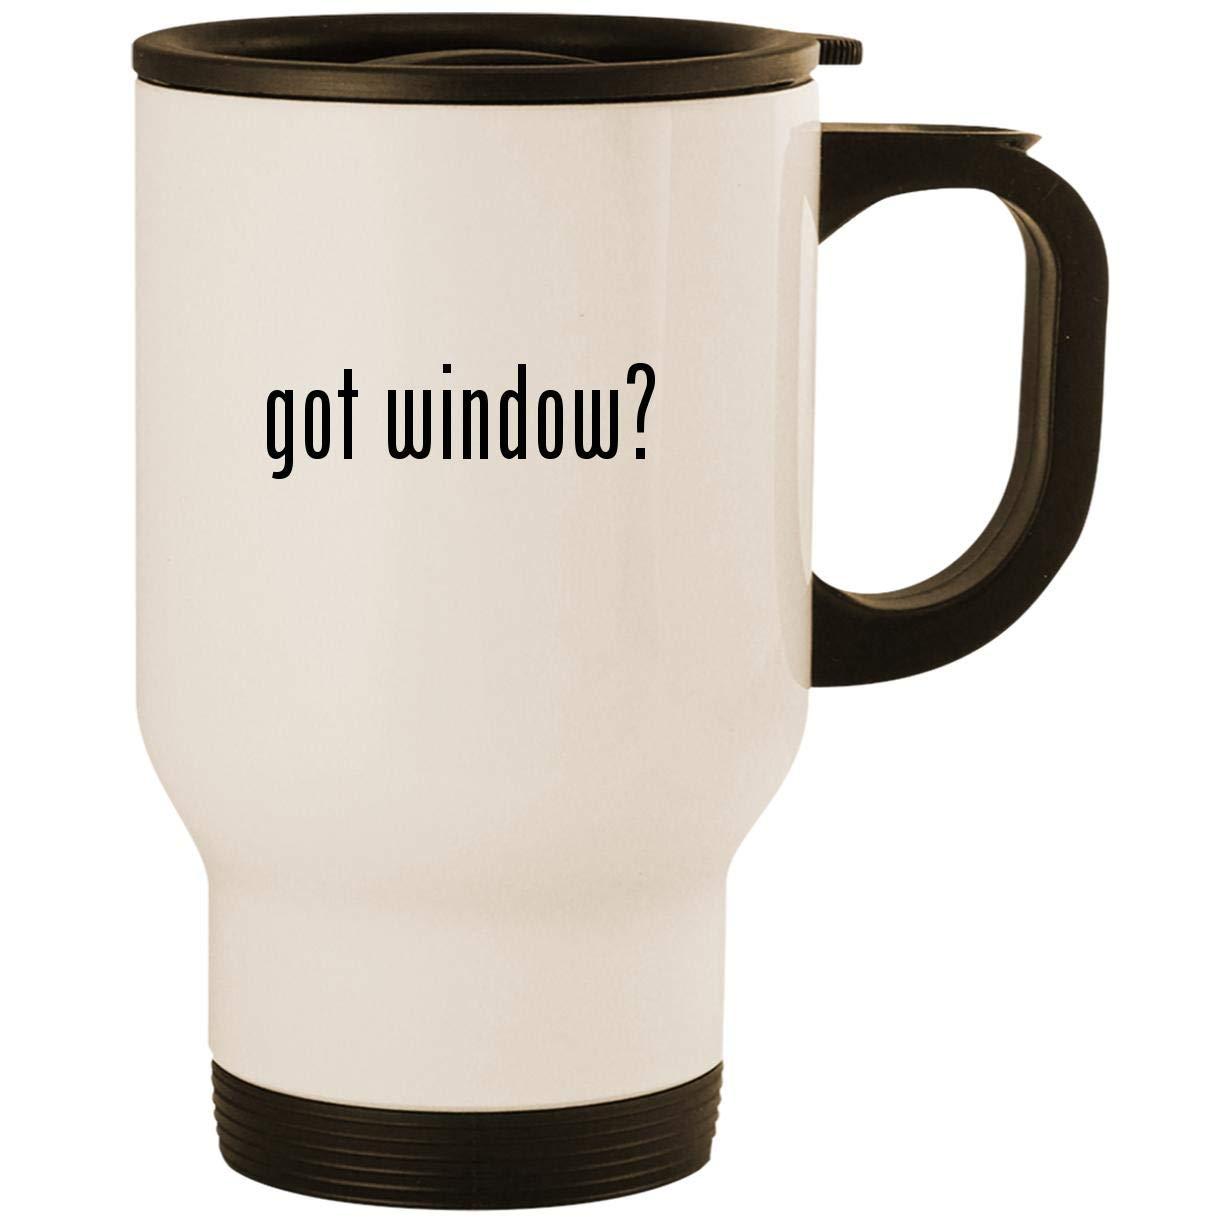 got window? - Stainless Steel 14oz Road Ready Travel Mug, White